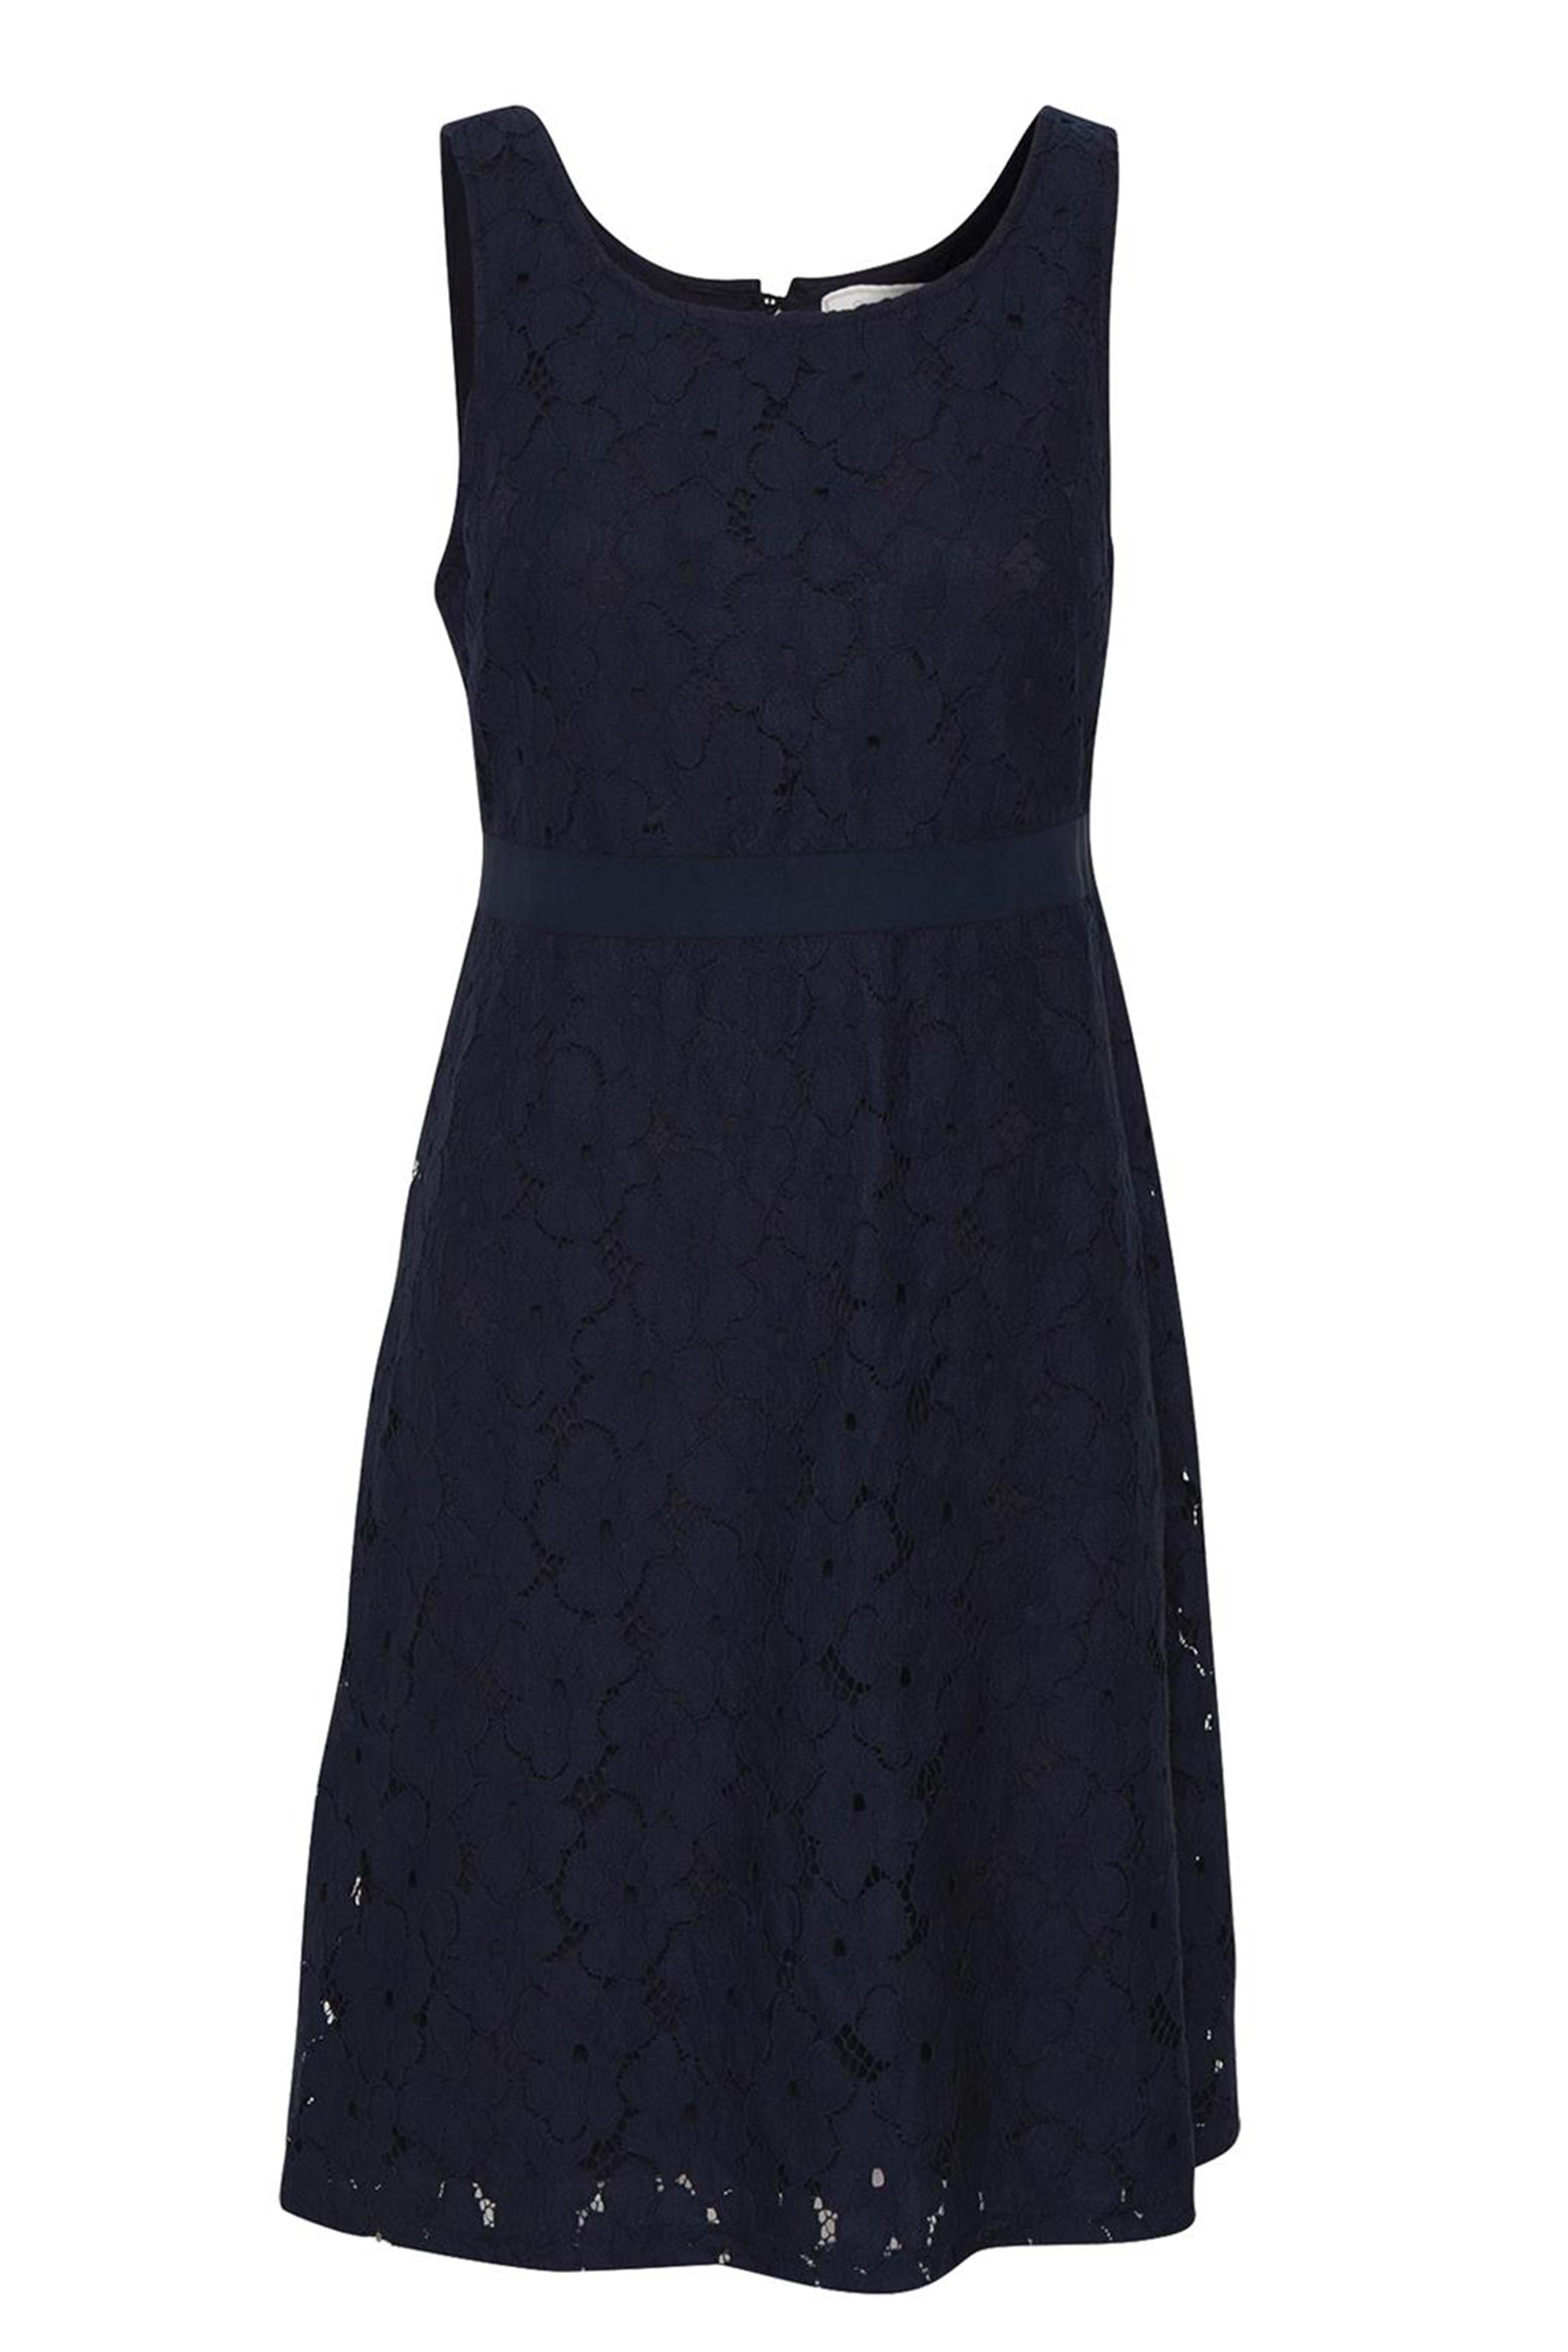 Royal Navy Blue